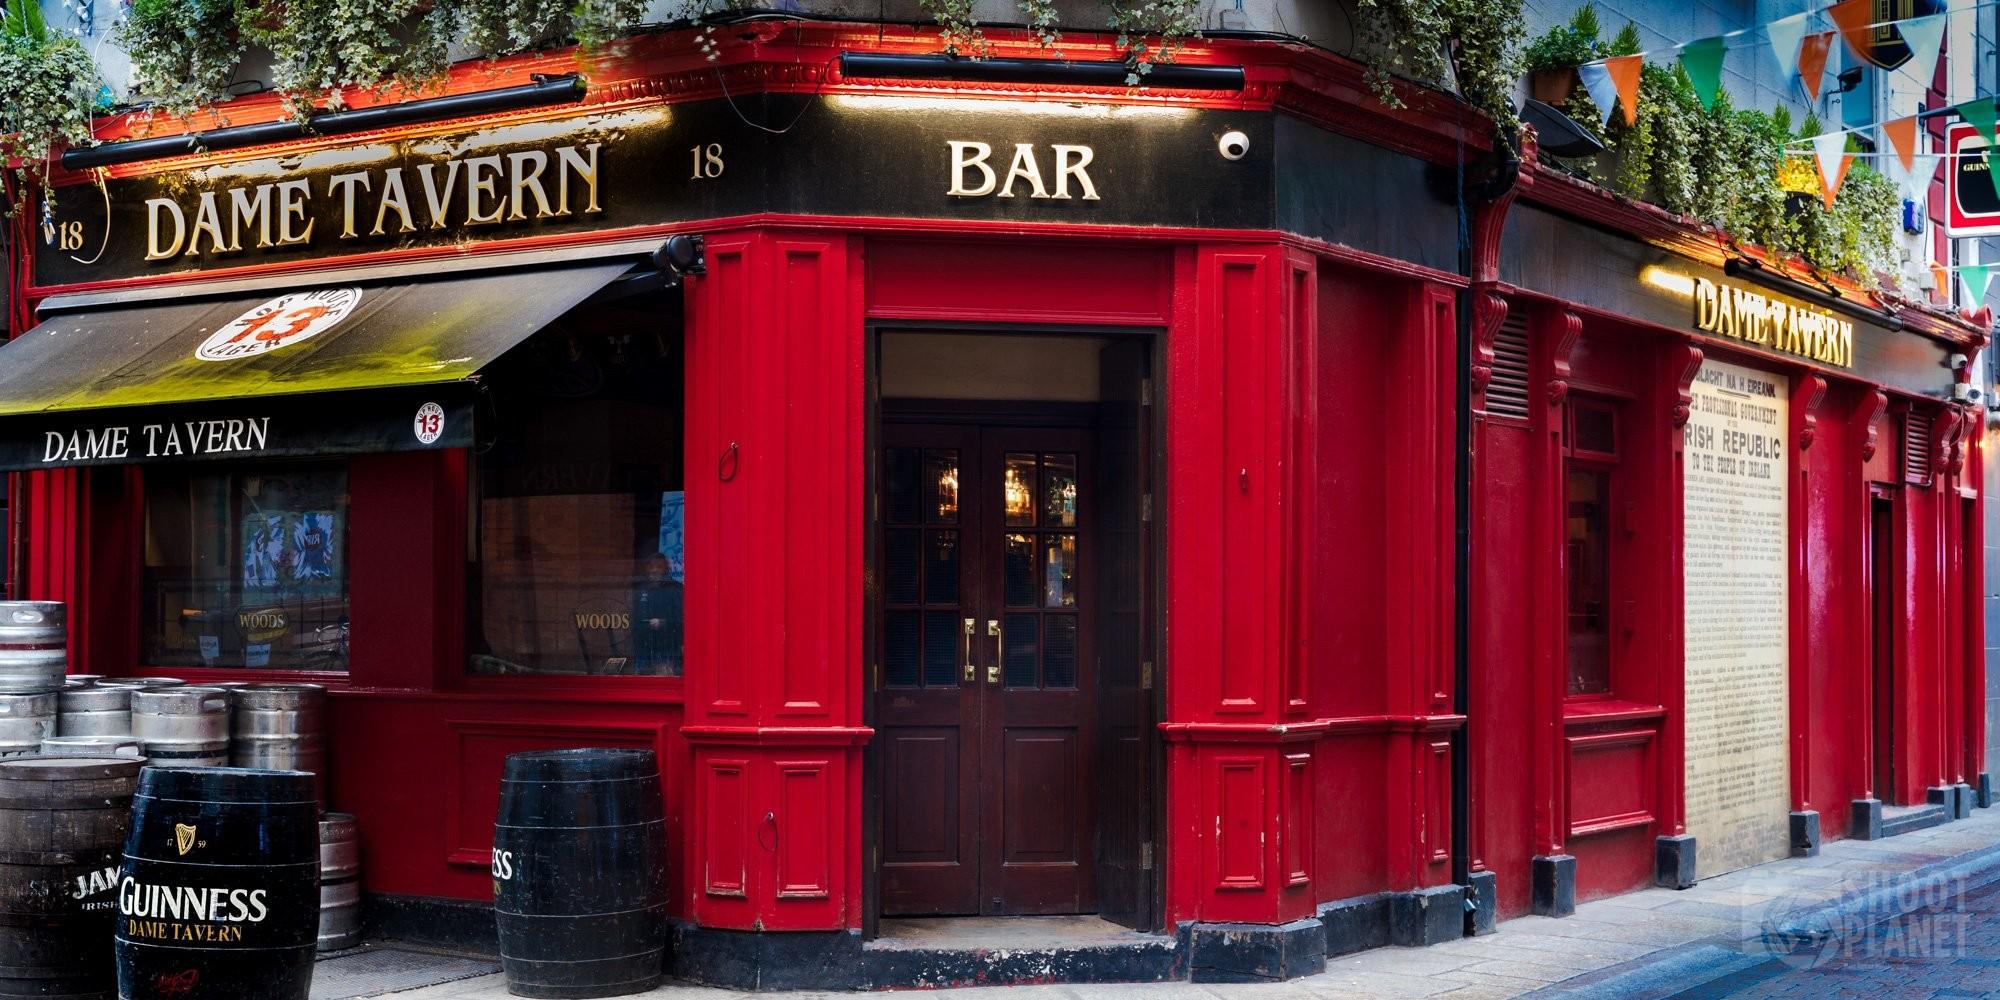 Dame Tavern pub in Dublin Ireland